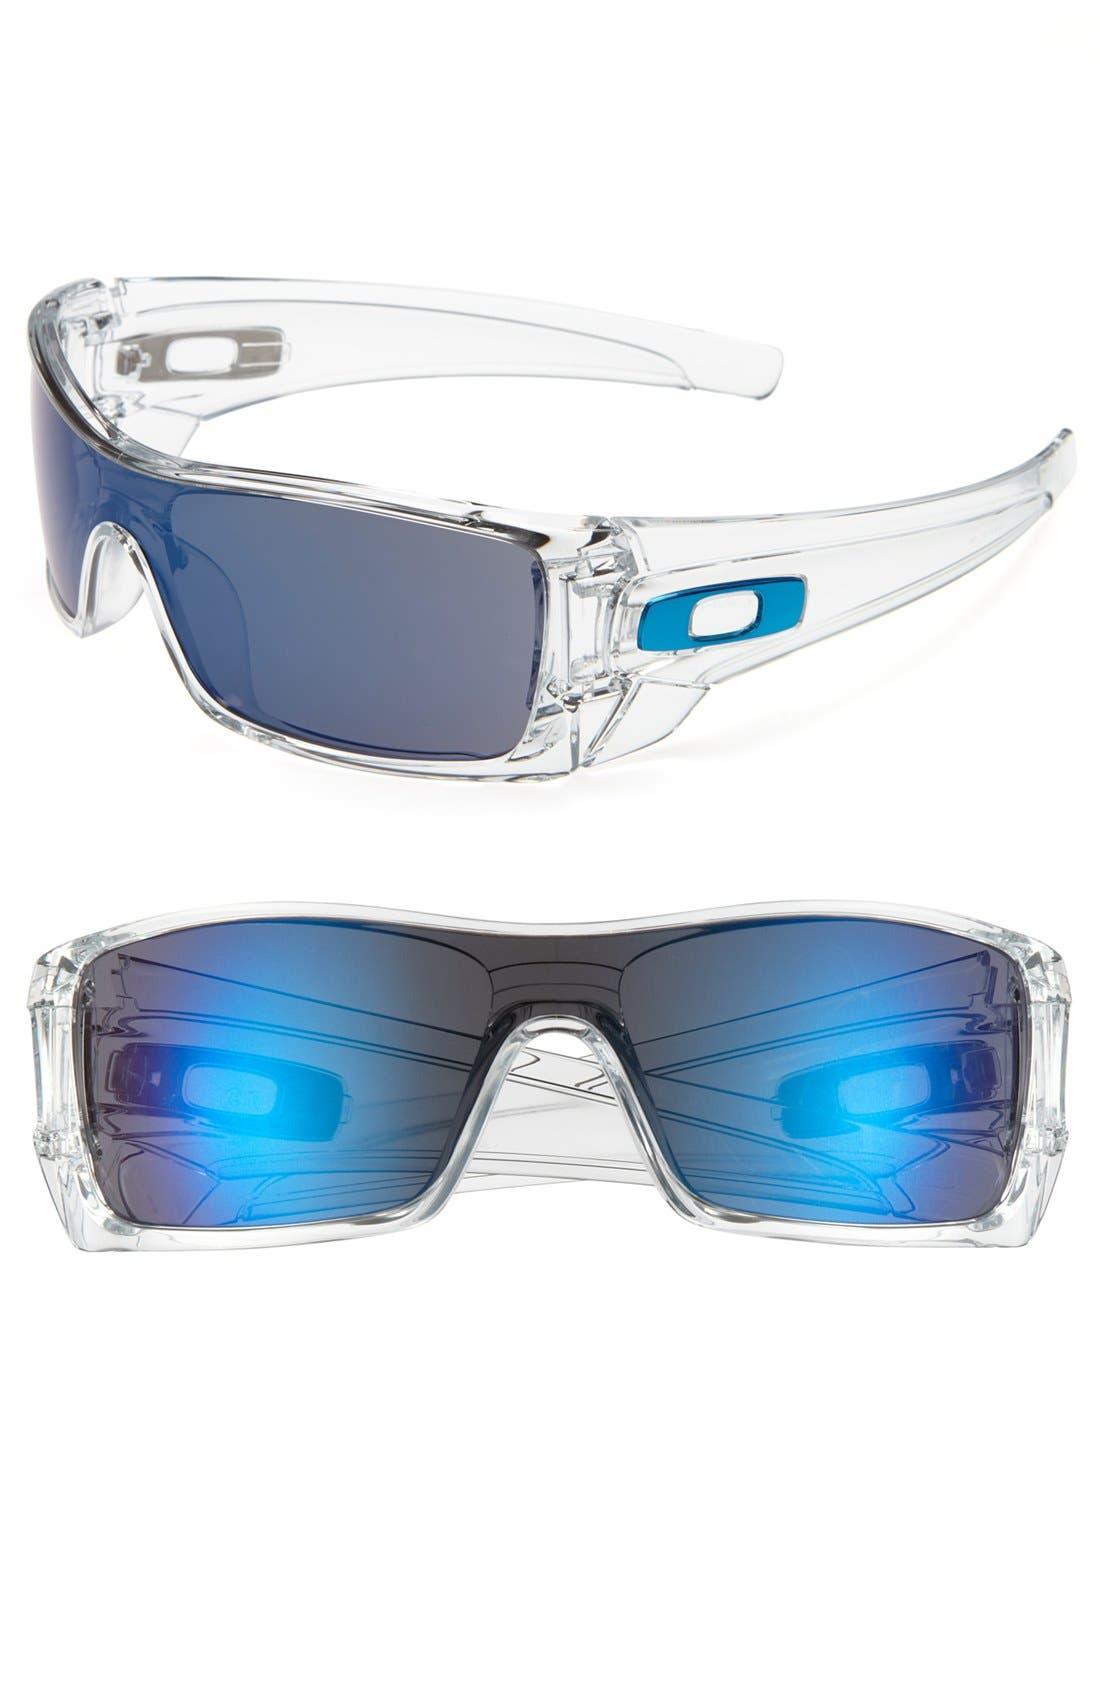 Alternate Image 1 Selected - Oakley 'Batwolf' Sunglasses